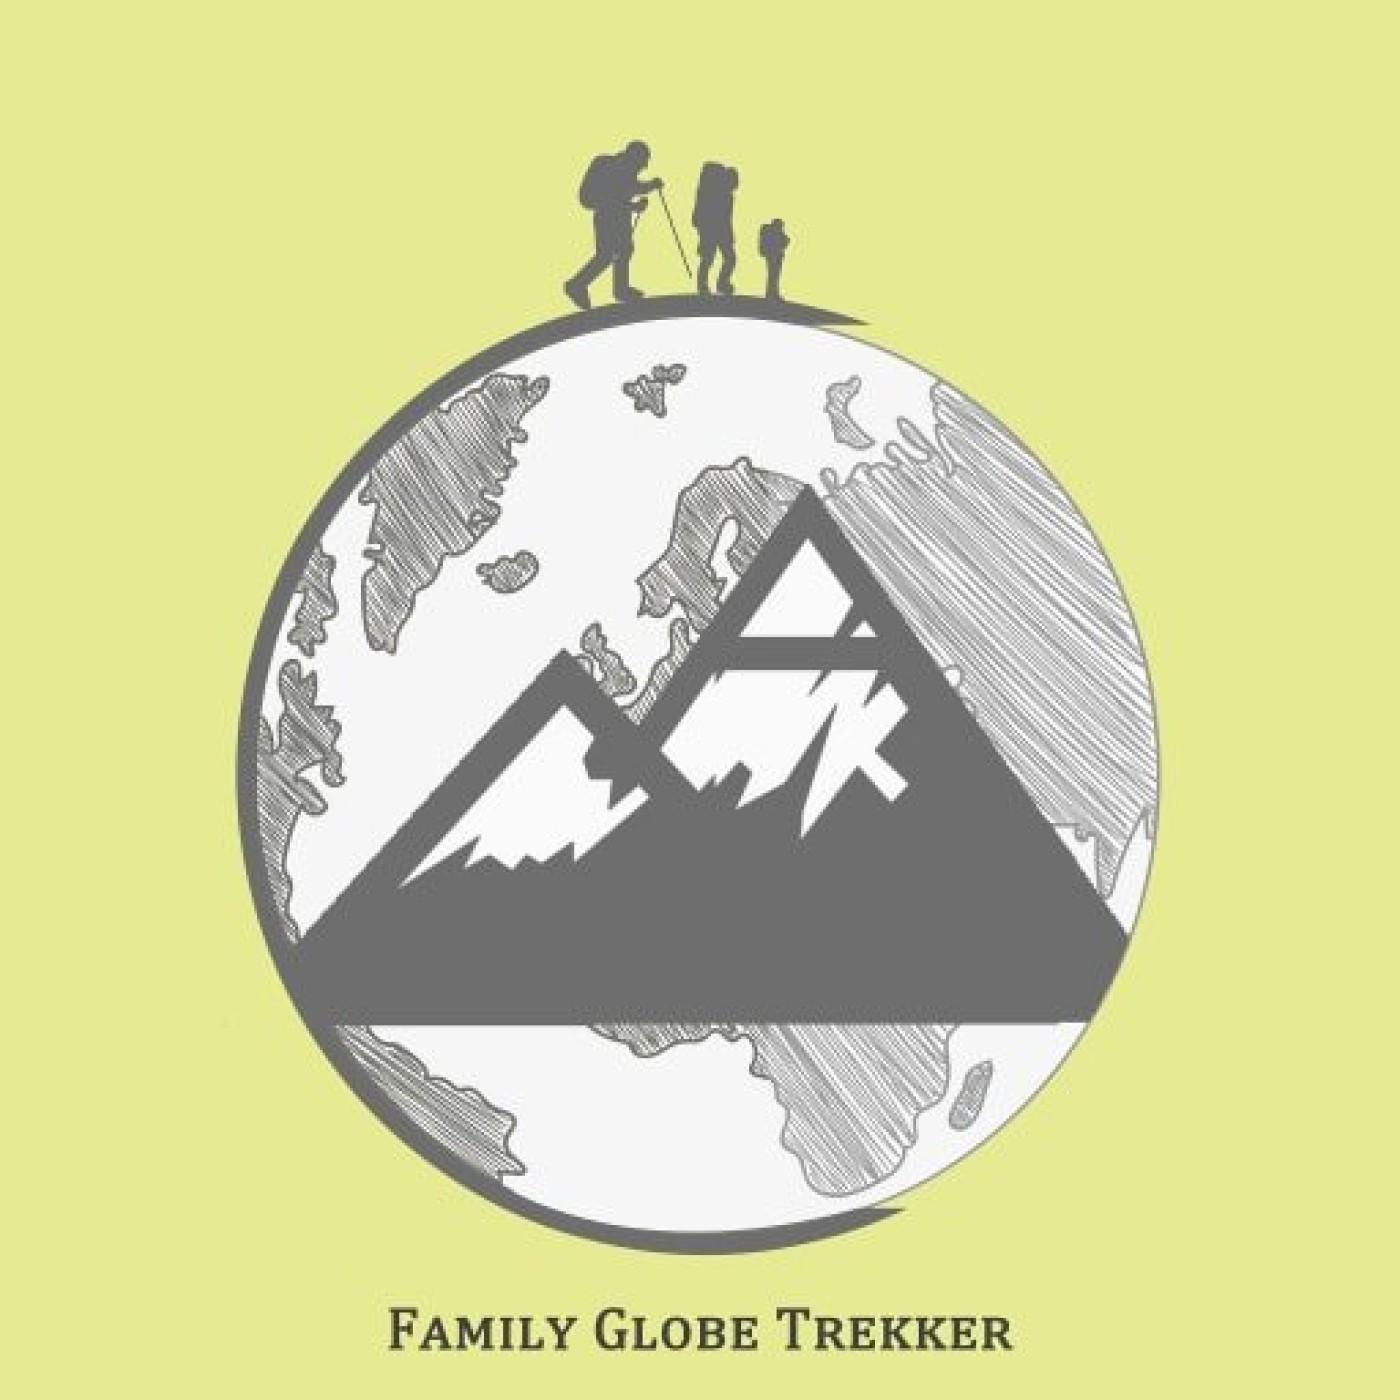 La Family Globe Trekker : Histoire d'une aventure familiale !